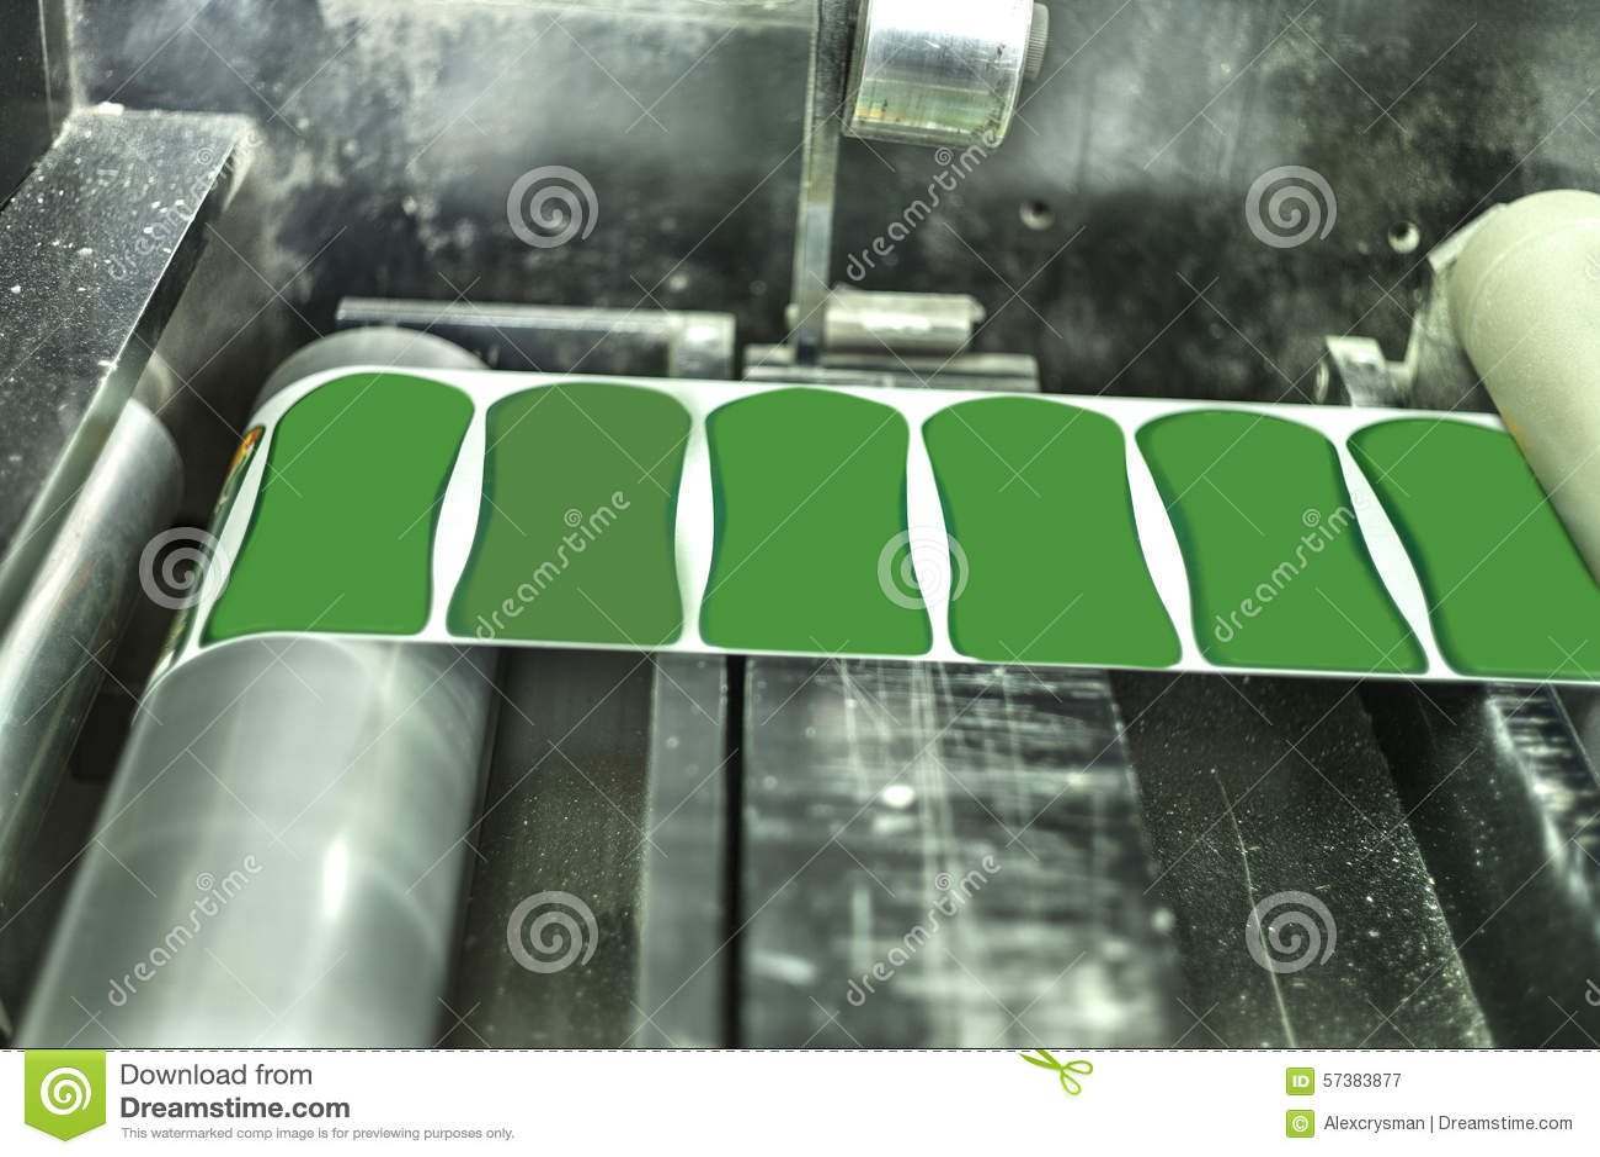 Druketiketten op de machine van de Etiketdruk